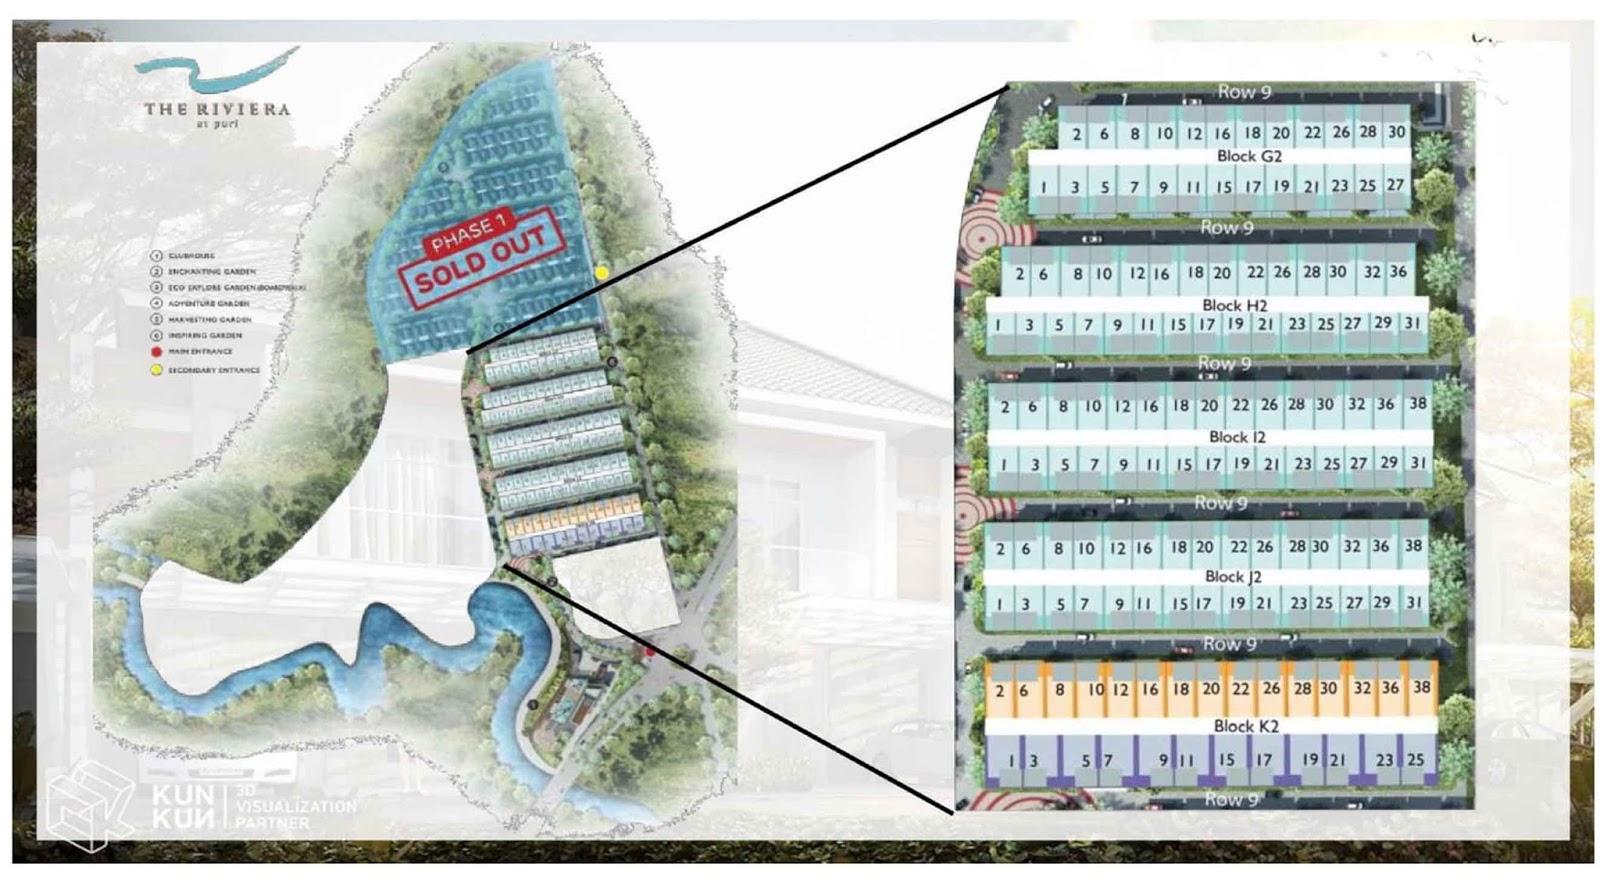 siteplan the riviera at puri tahap phase 2